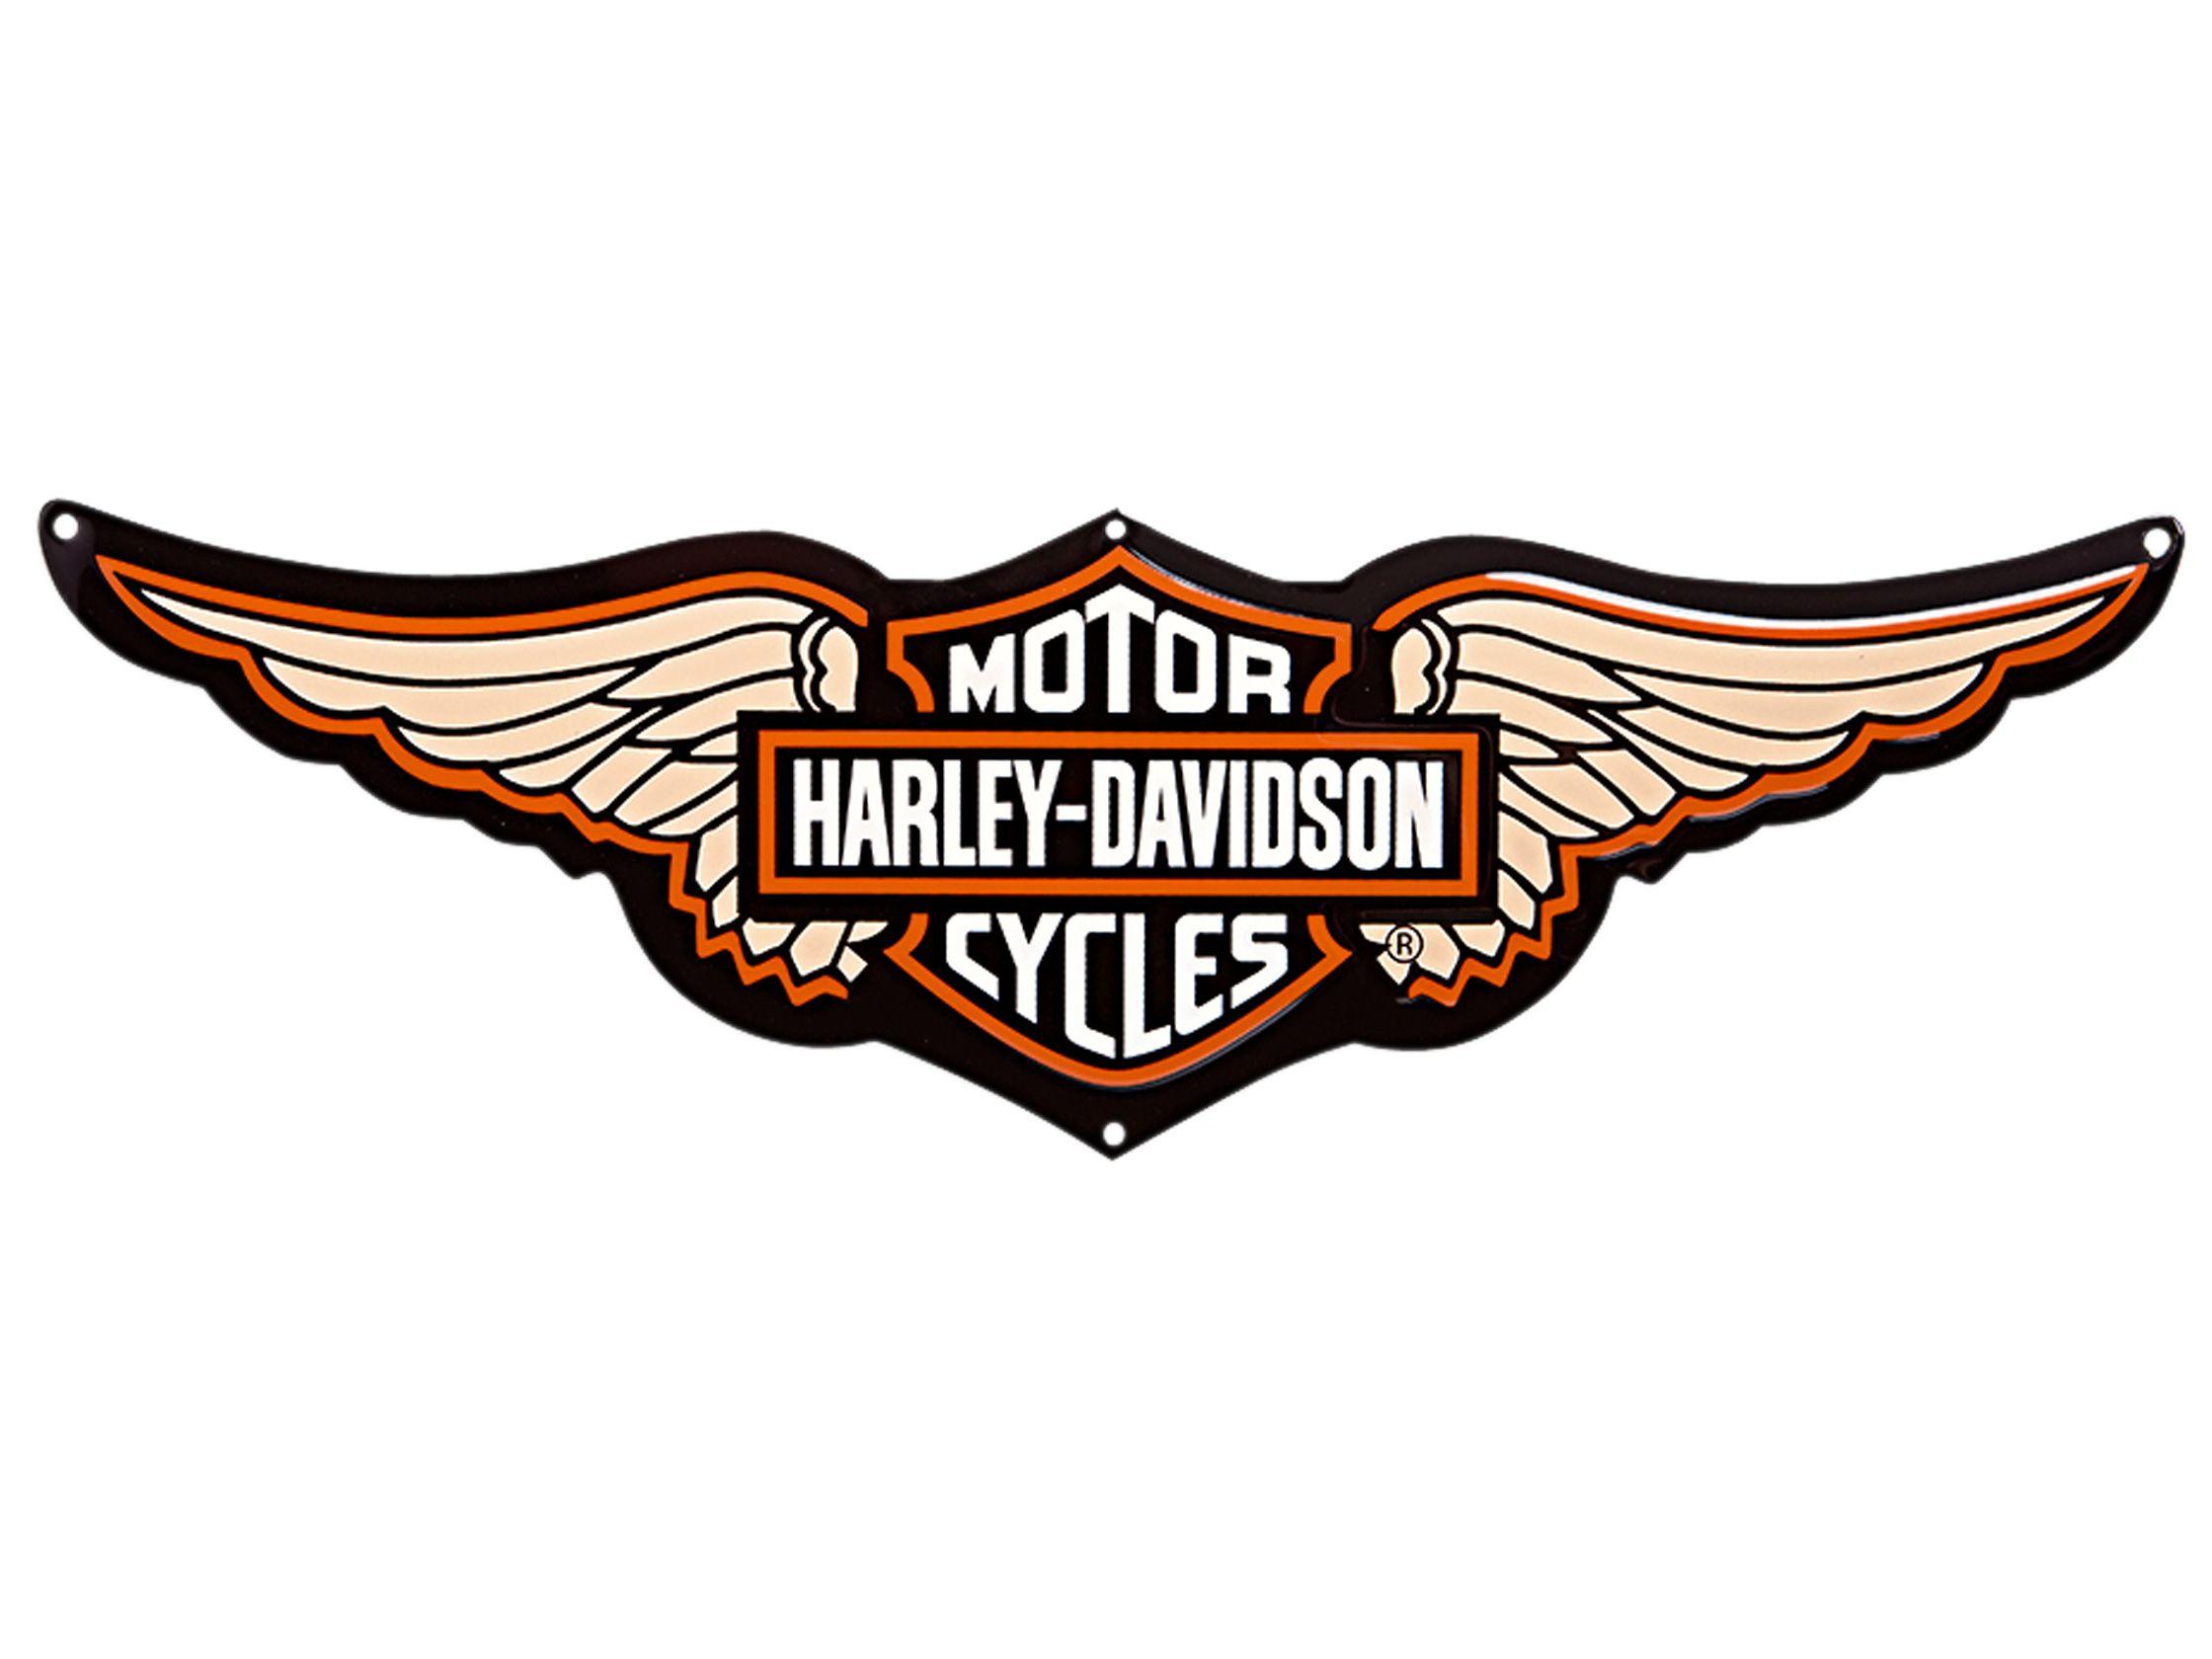 harley davidson logo images wallpaper hd 3444 wallpaper rh pinterest com harley davidson logos you can print harley davidson logos for sale